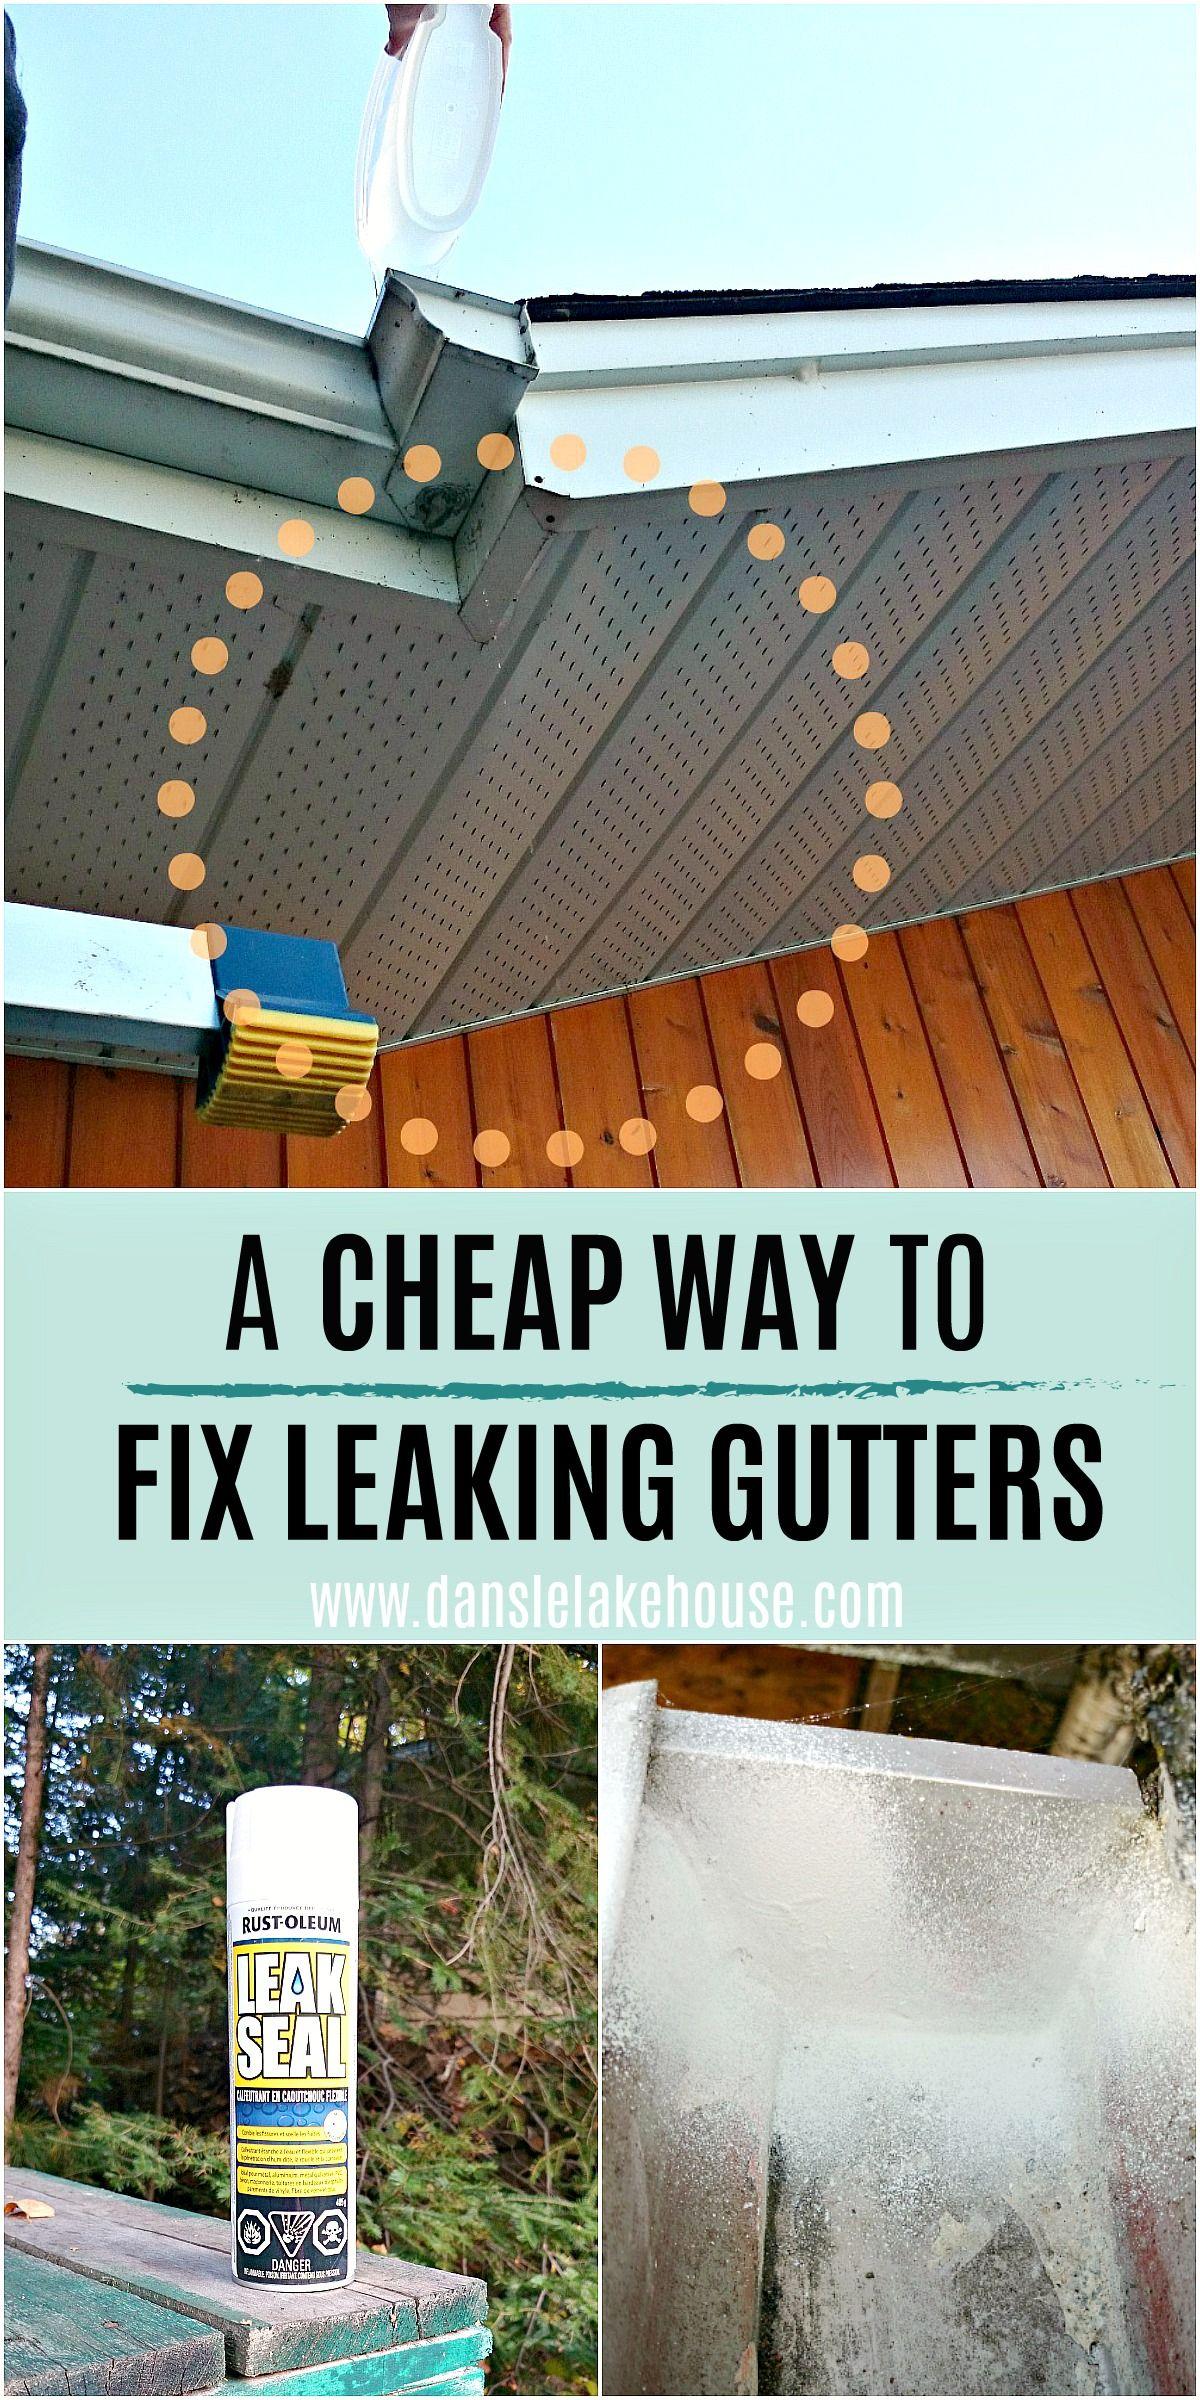 Cheap Way To Fix Leaking Gutters Gutters Diy Gutters Gutter Repair